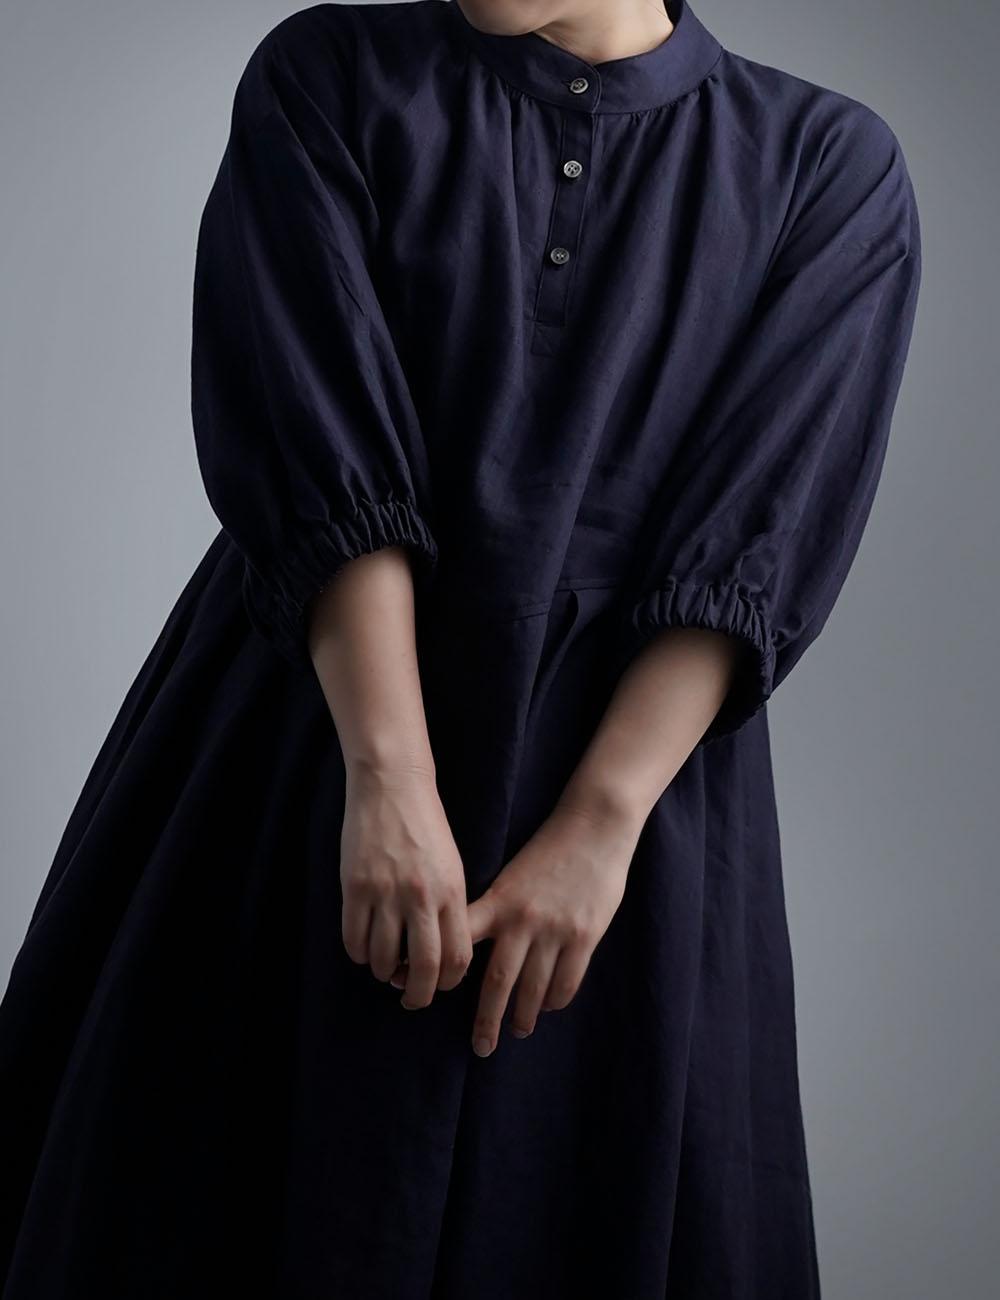 【wafu】Linen Dress スタンドカラーワンピース 超高密度リネン /黒紅色 a073i-kbi1